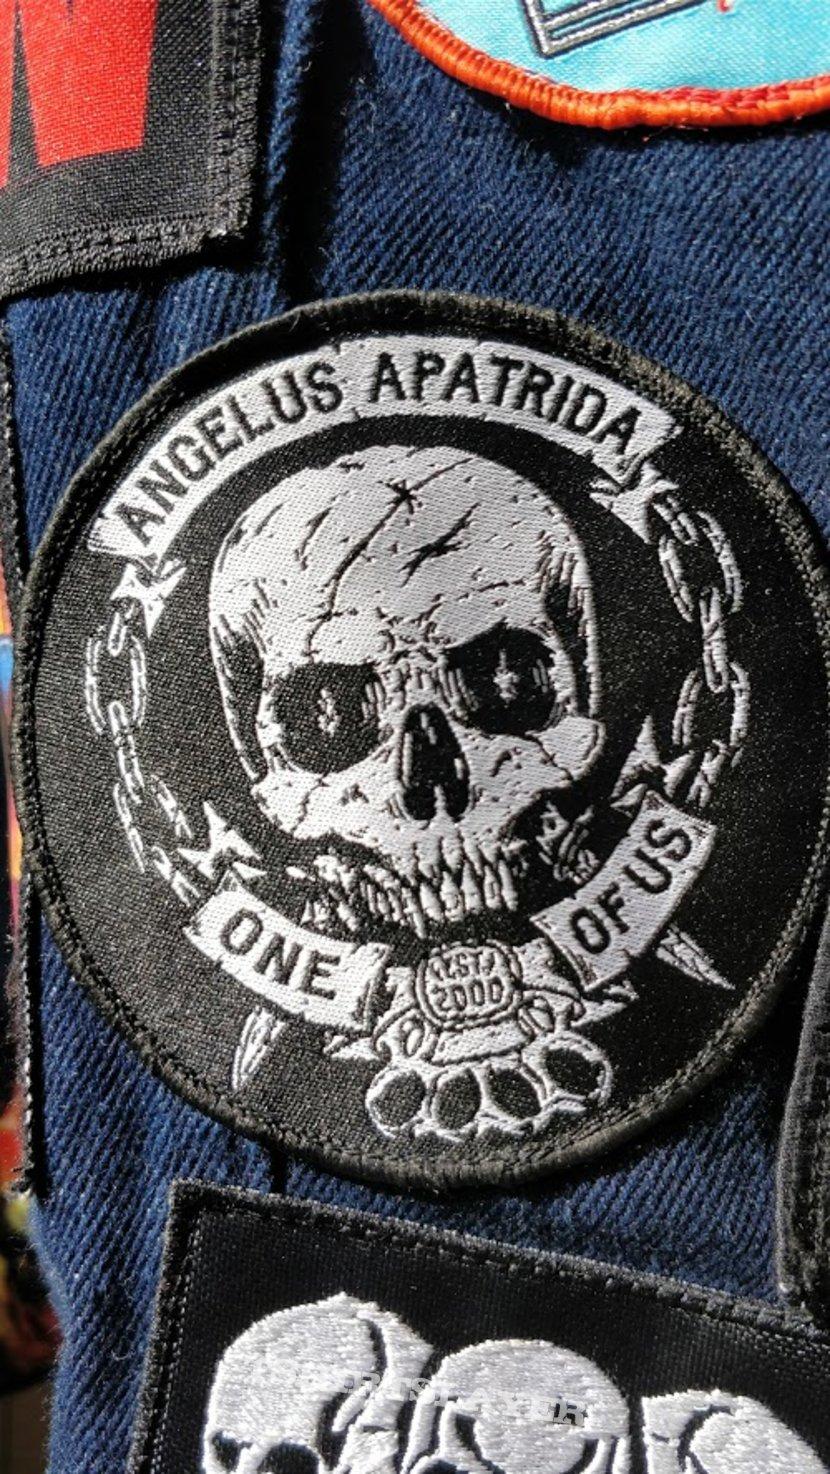 Angelus Apatrida - One of Us - Patch